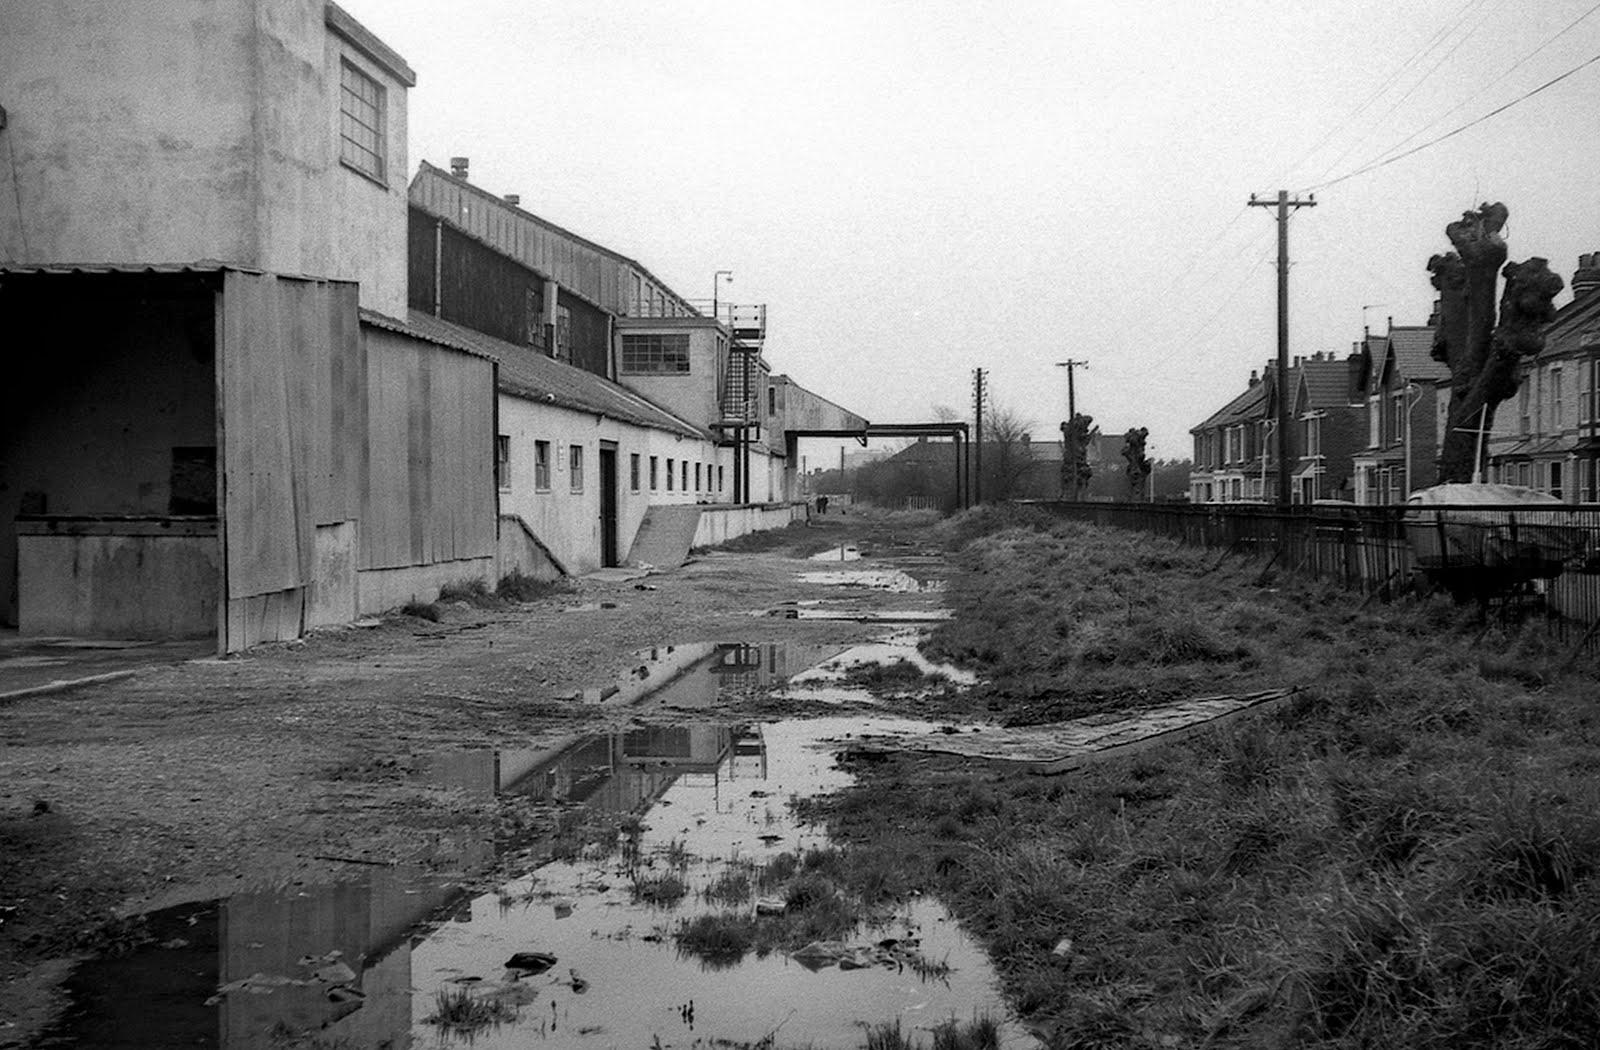 Wallpaper Factory siding